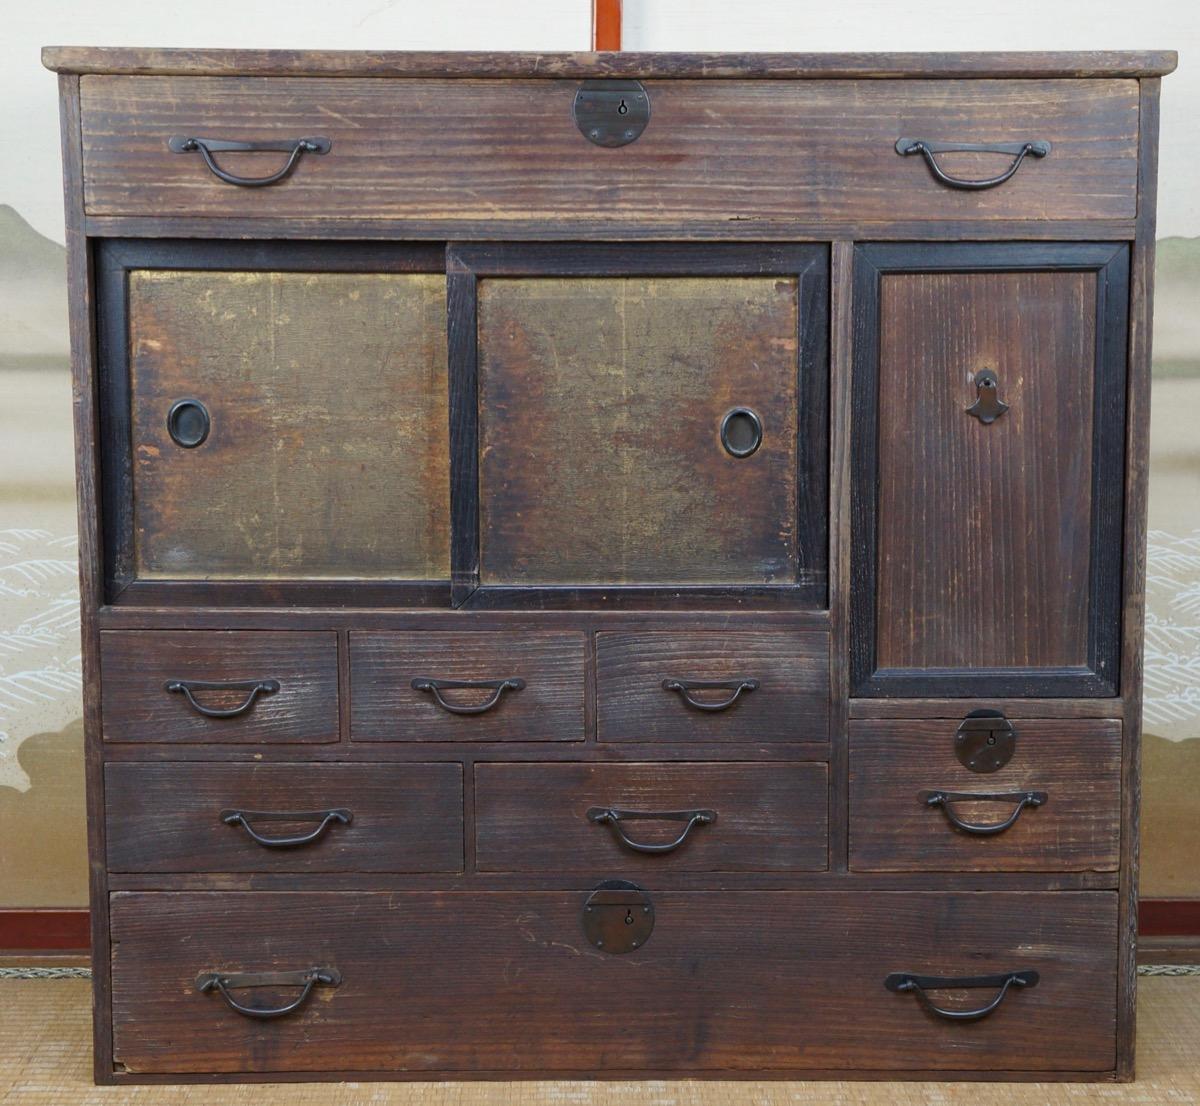 Materials: wood, bronze - Antique Chadansu Japanese Furniture 1900s Japan Cabinet Tansu Craft